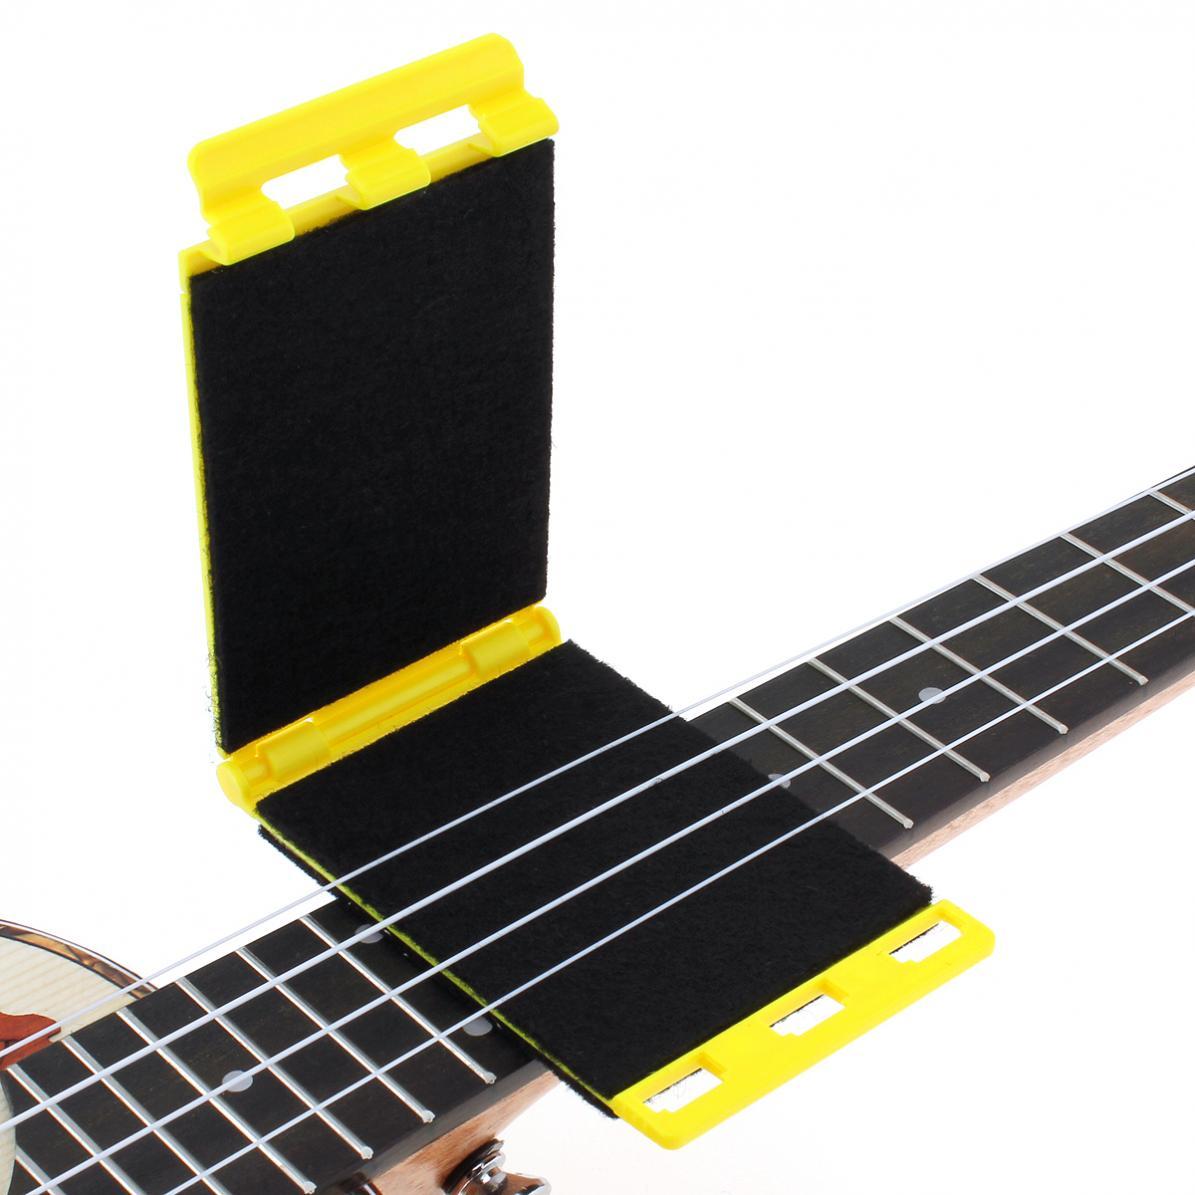 Limpiador de cuerdas de guitarra de dos caras con cepillo de fibra suave pequeño y duradero para guitarra ukelele Banjo Bass